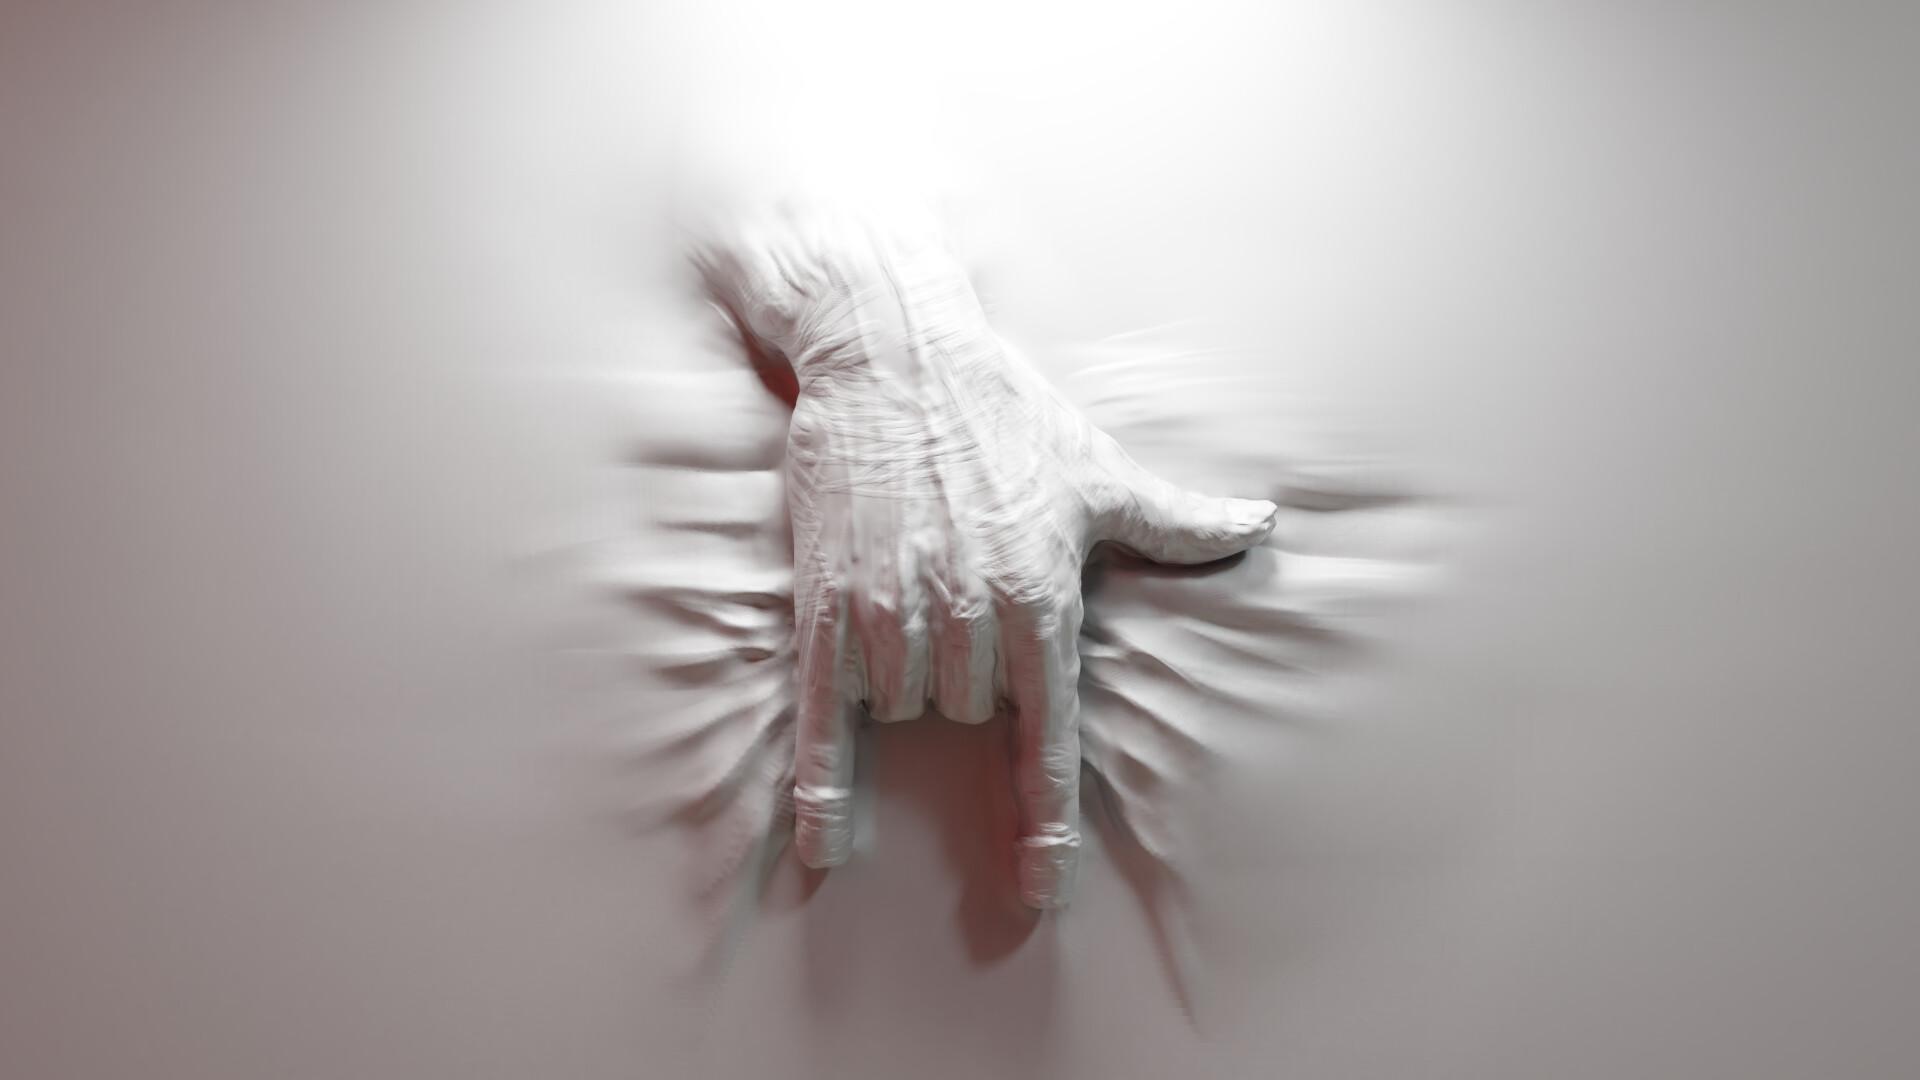 Michael wu 17 hand pose rendering